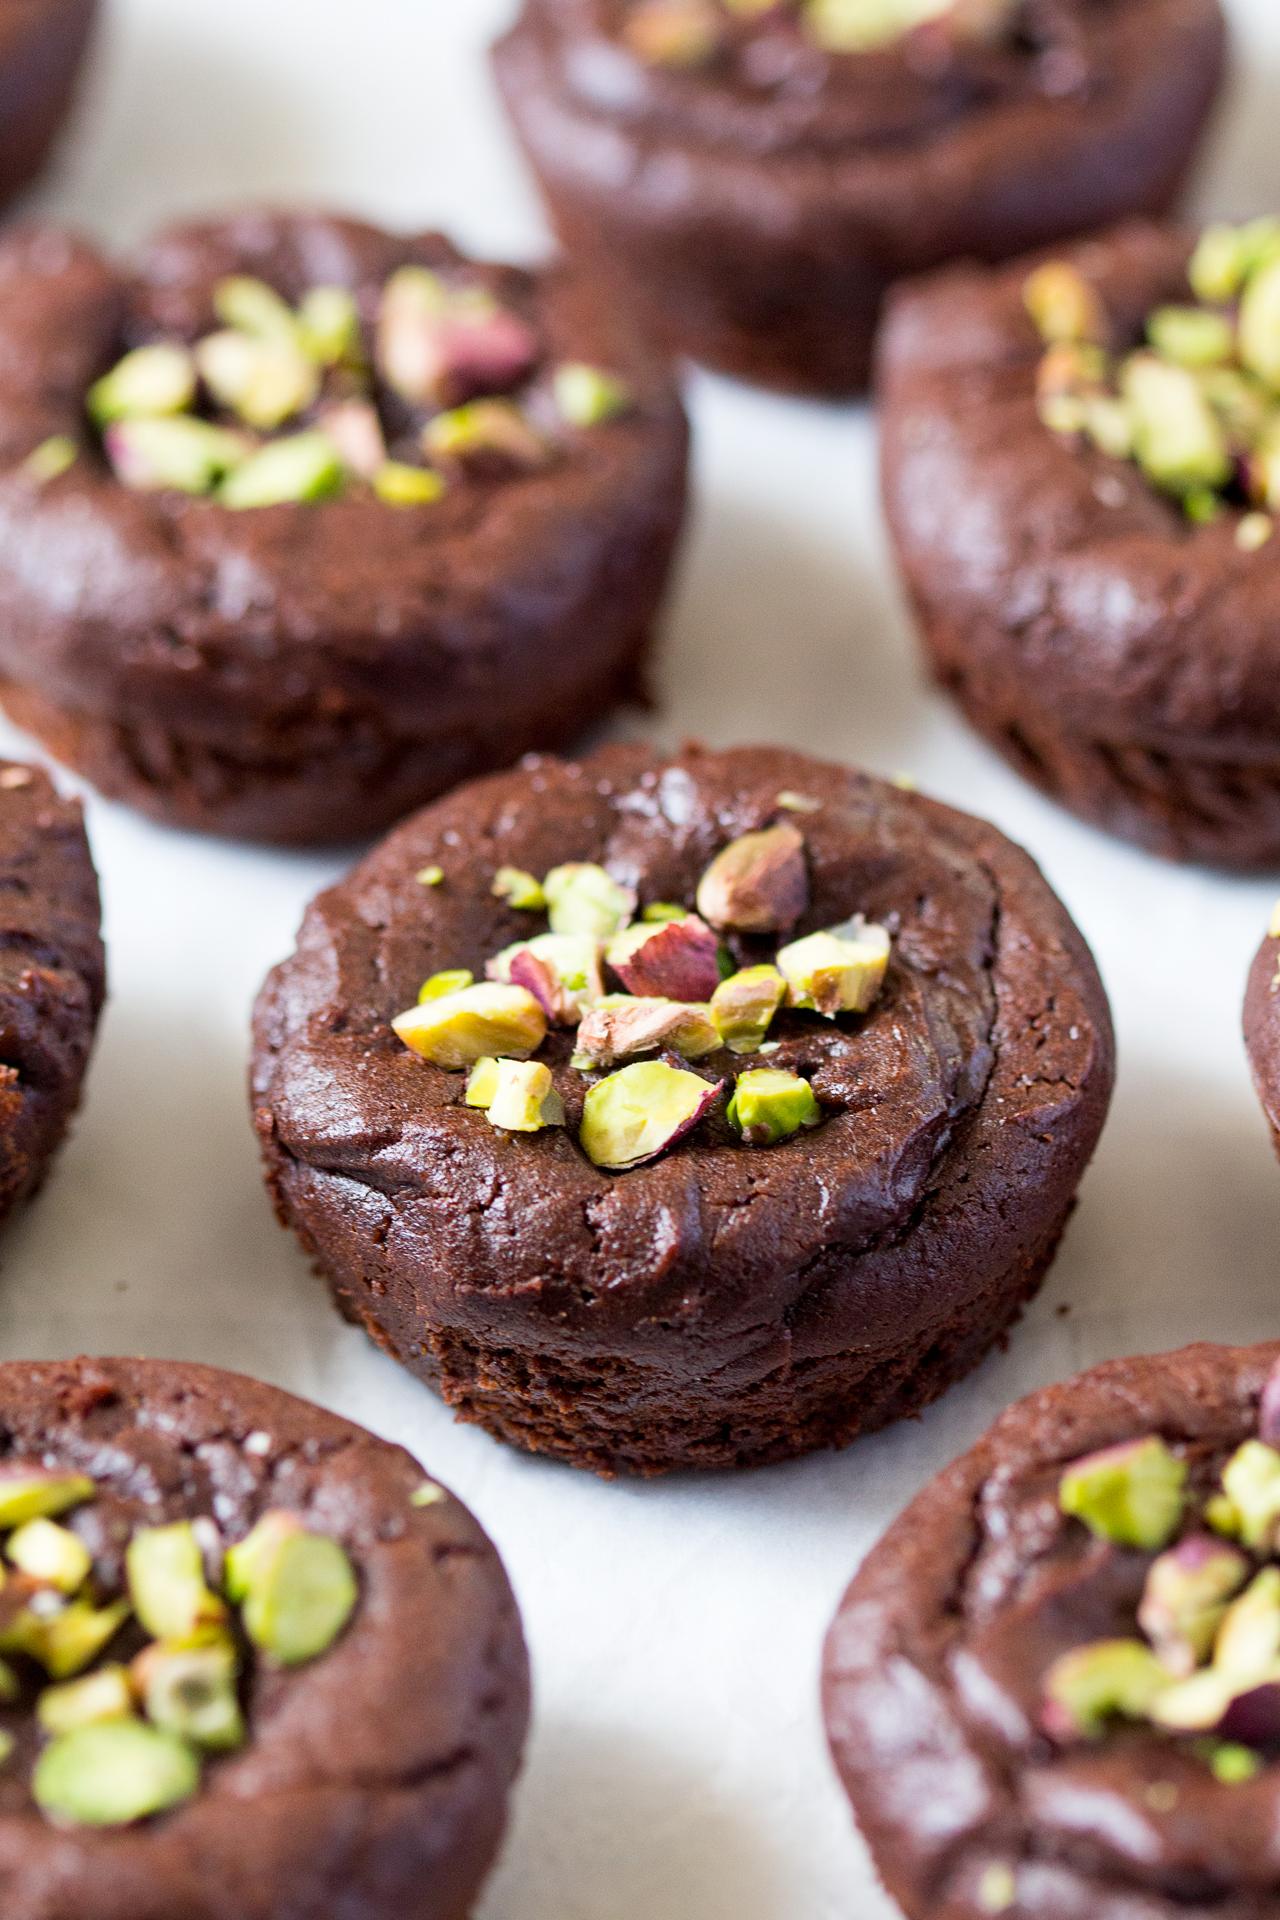 wegańskie mokre brownies upieczone